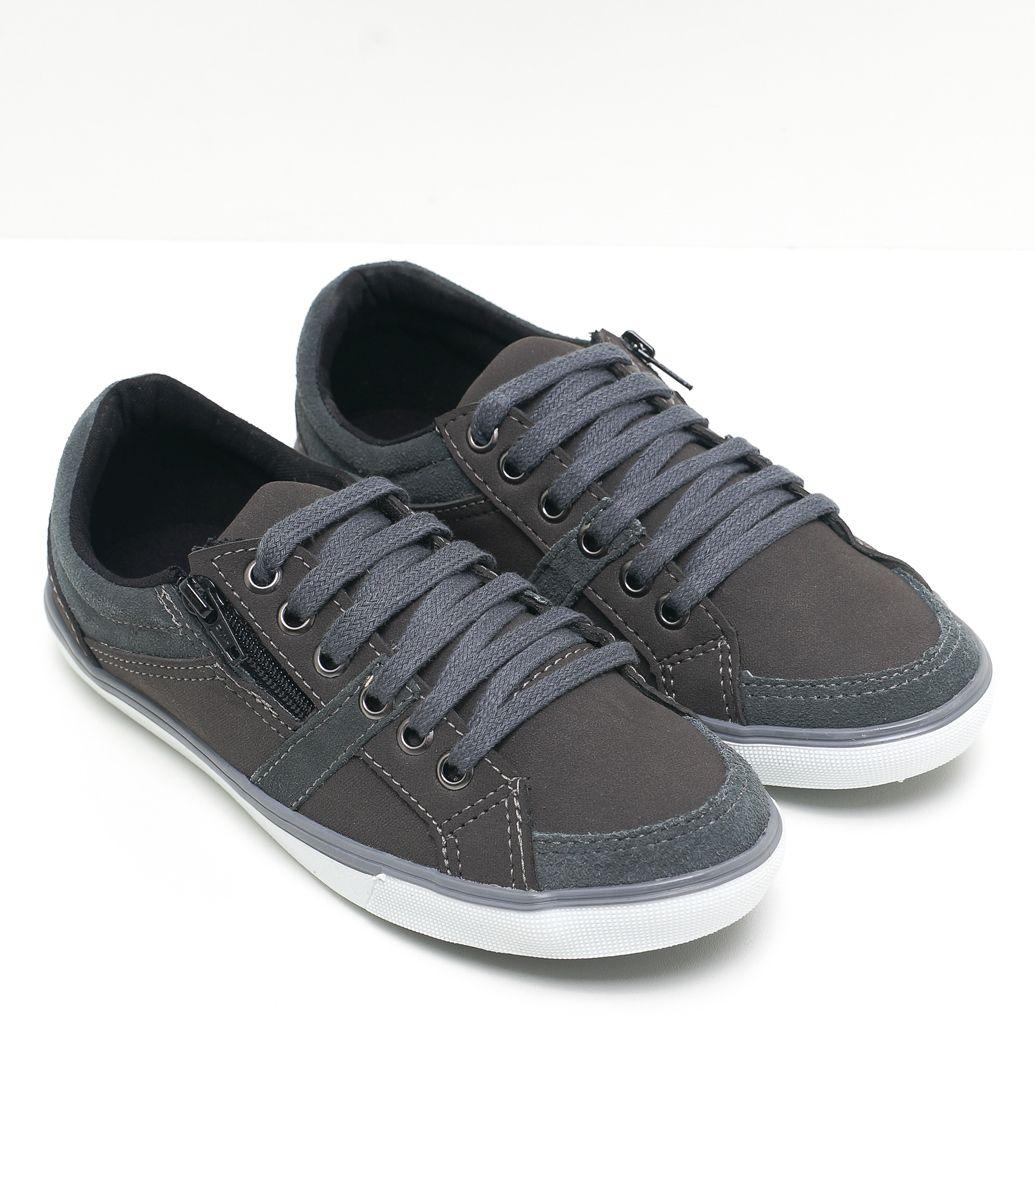 ... Shoes 9f2882730afb53  Tênis infantil Material sintético Com zíper na  lateral Marca Fuzarka COLEÇÃO VERÃO 2017 Veja f11d45699d60ed ... 9c00c21c49eec